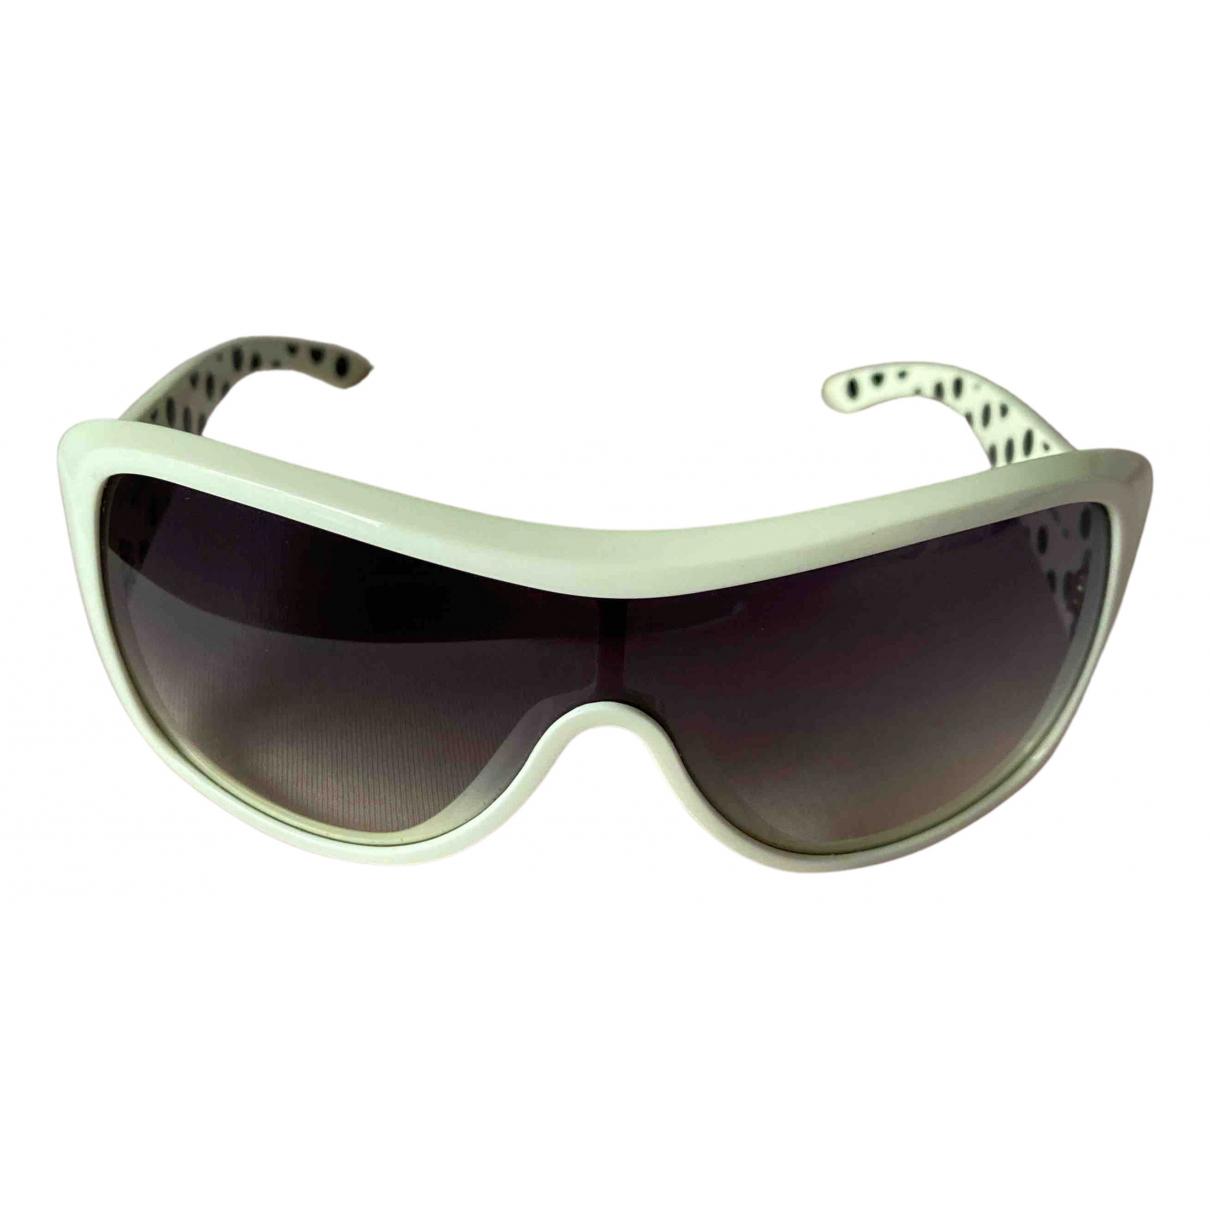 Miu Miu N White Sunglasses for Women N